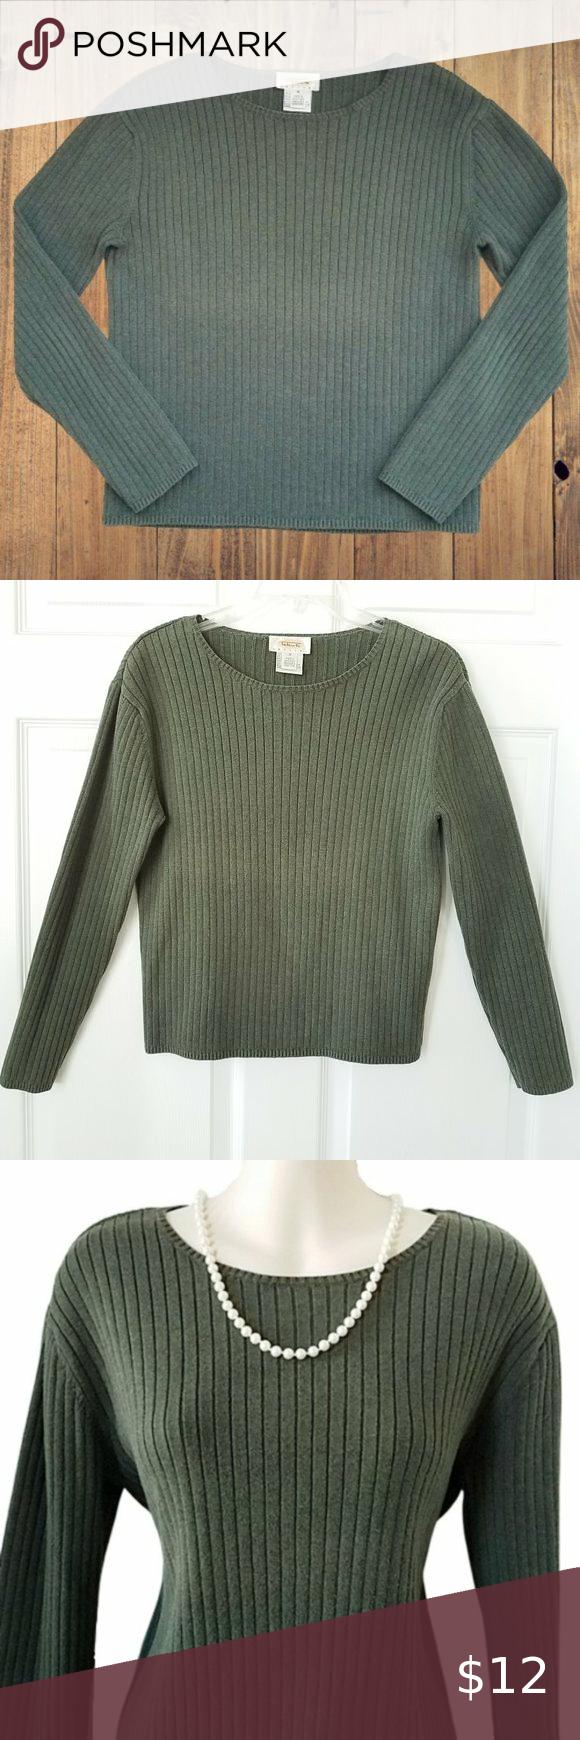 Talbots Petites Green Crew Neck Cotton Sweater in 2020